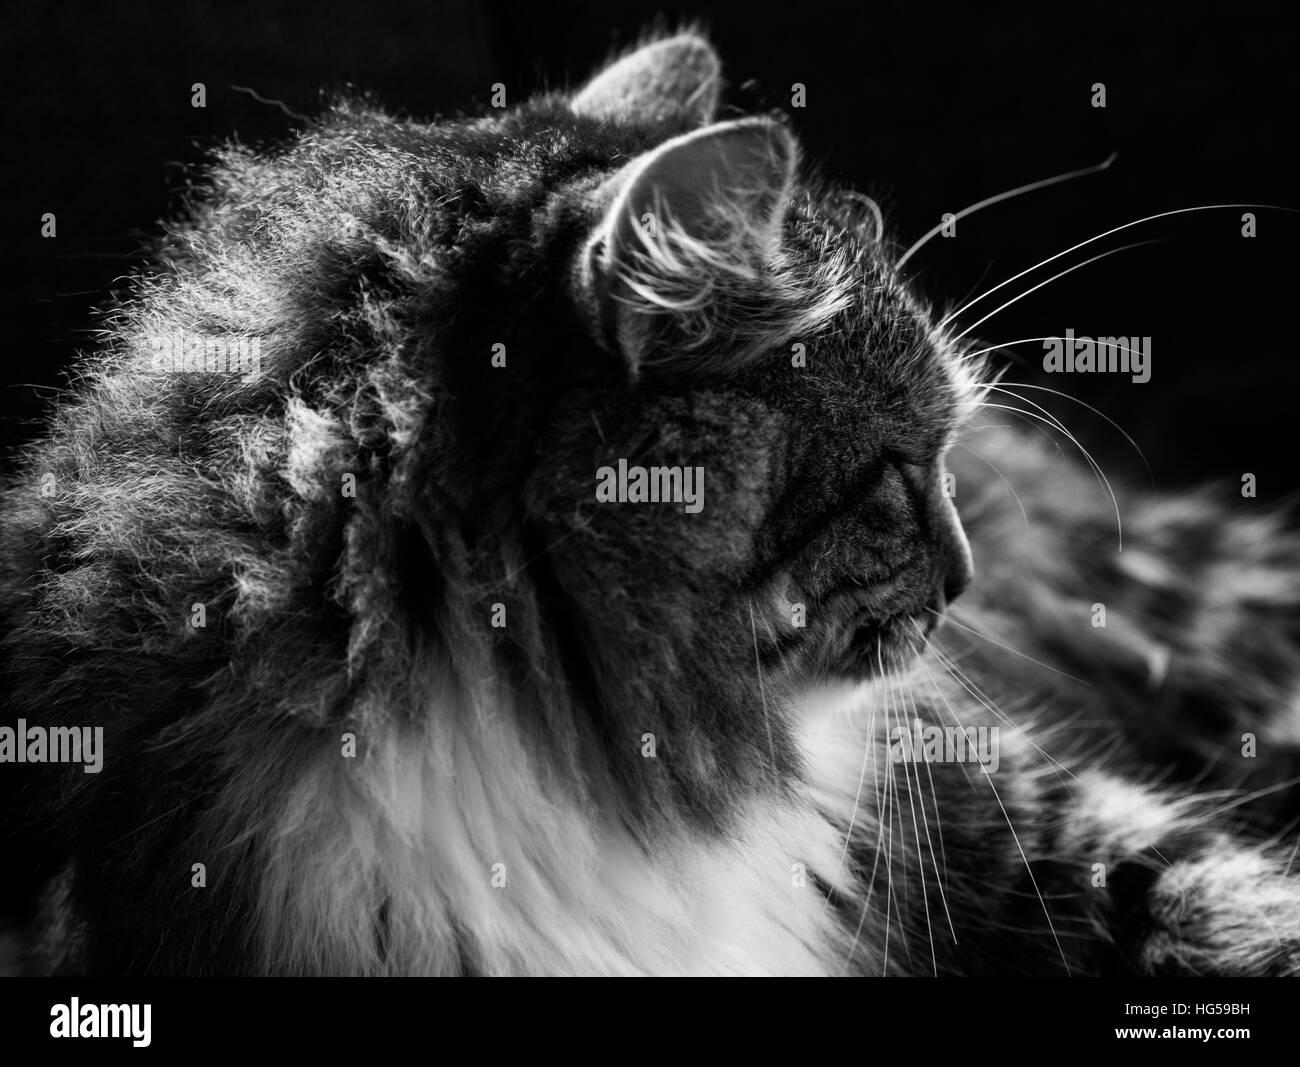 Fluffy cat II - Stock Image